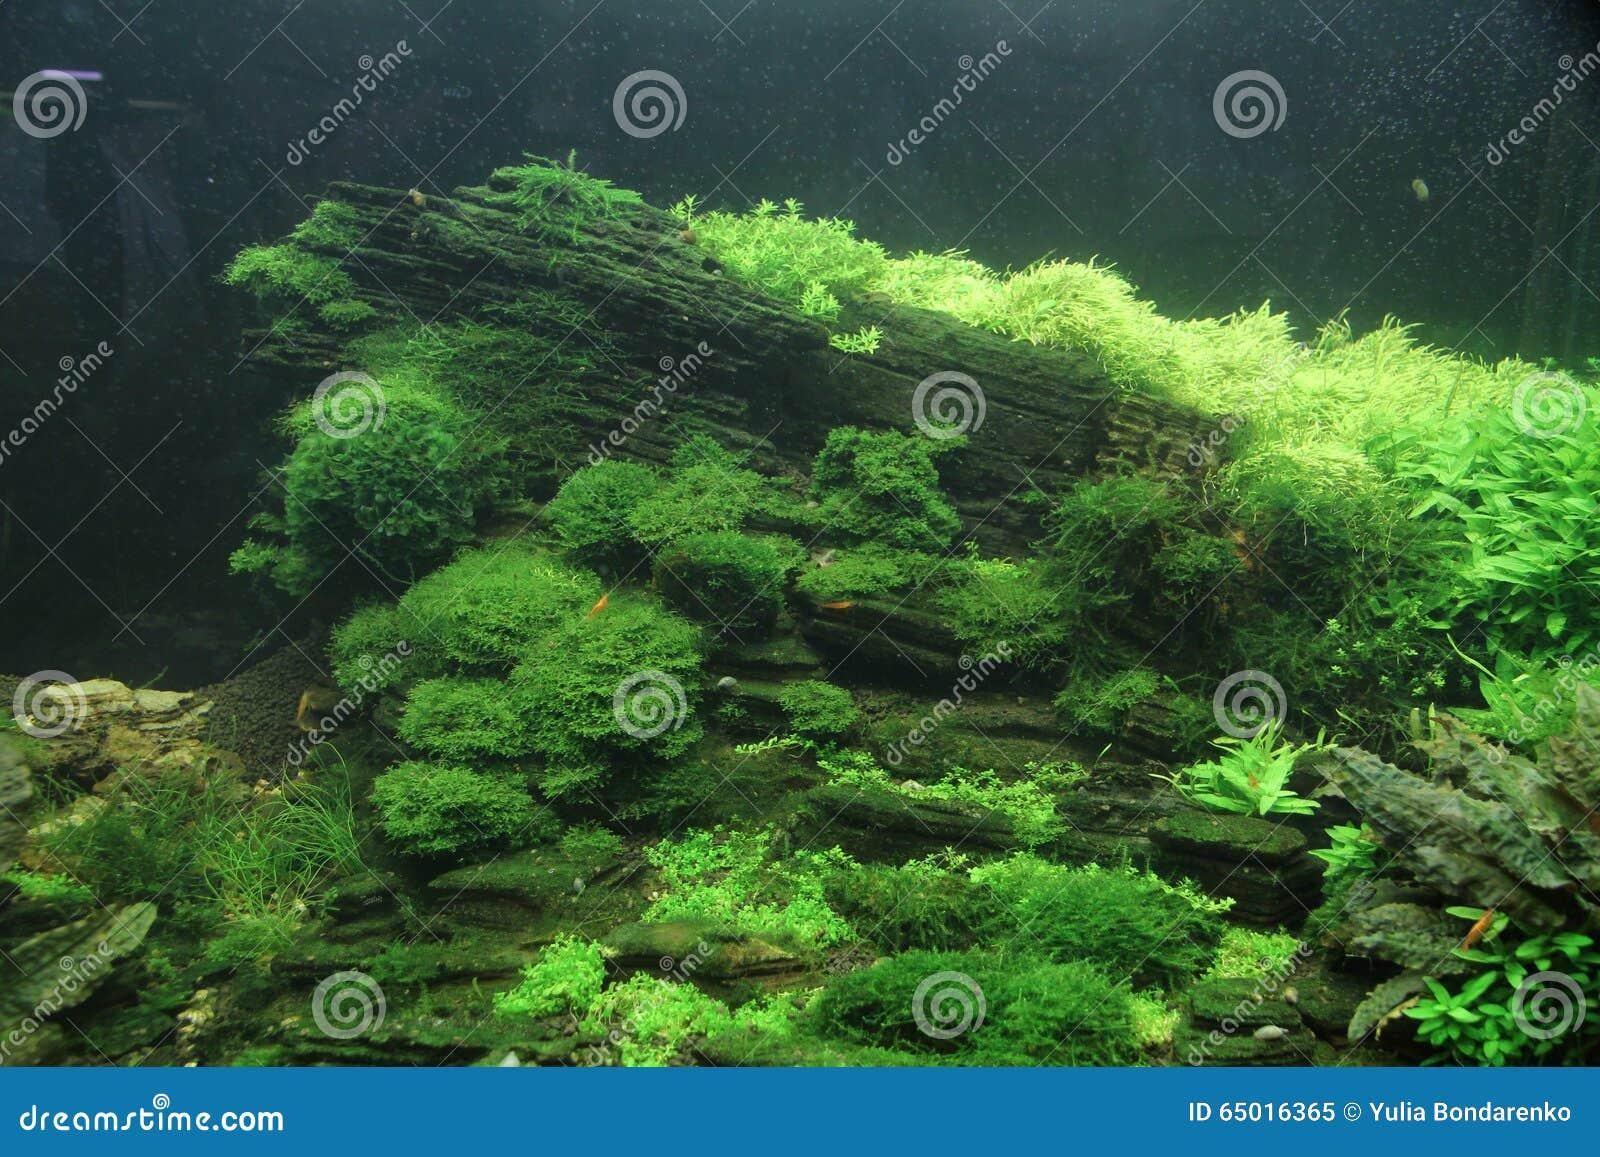 Aquarium fish in a beautiful green landscape